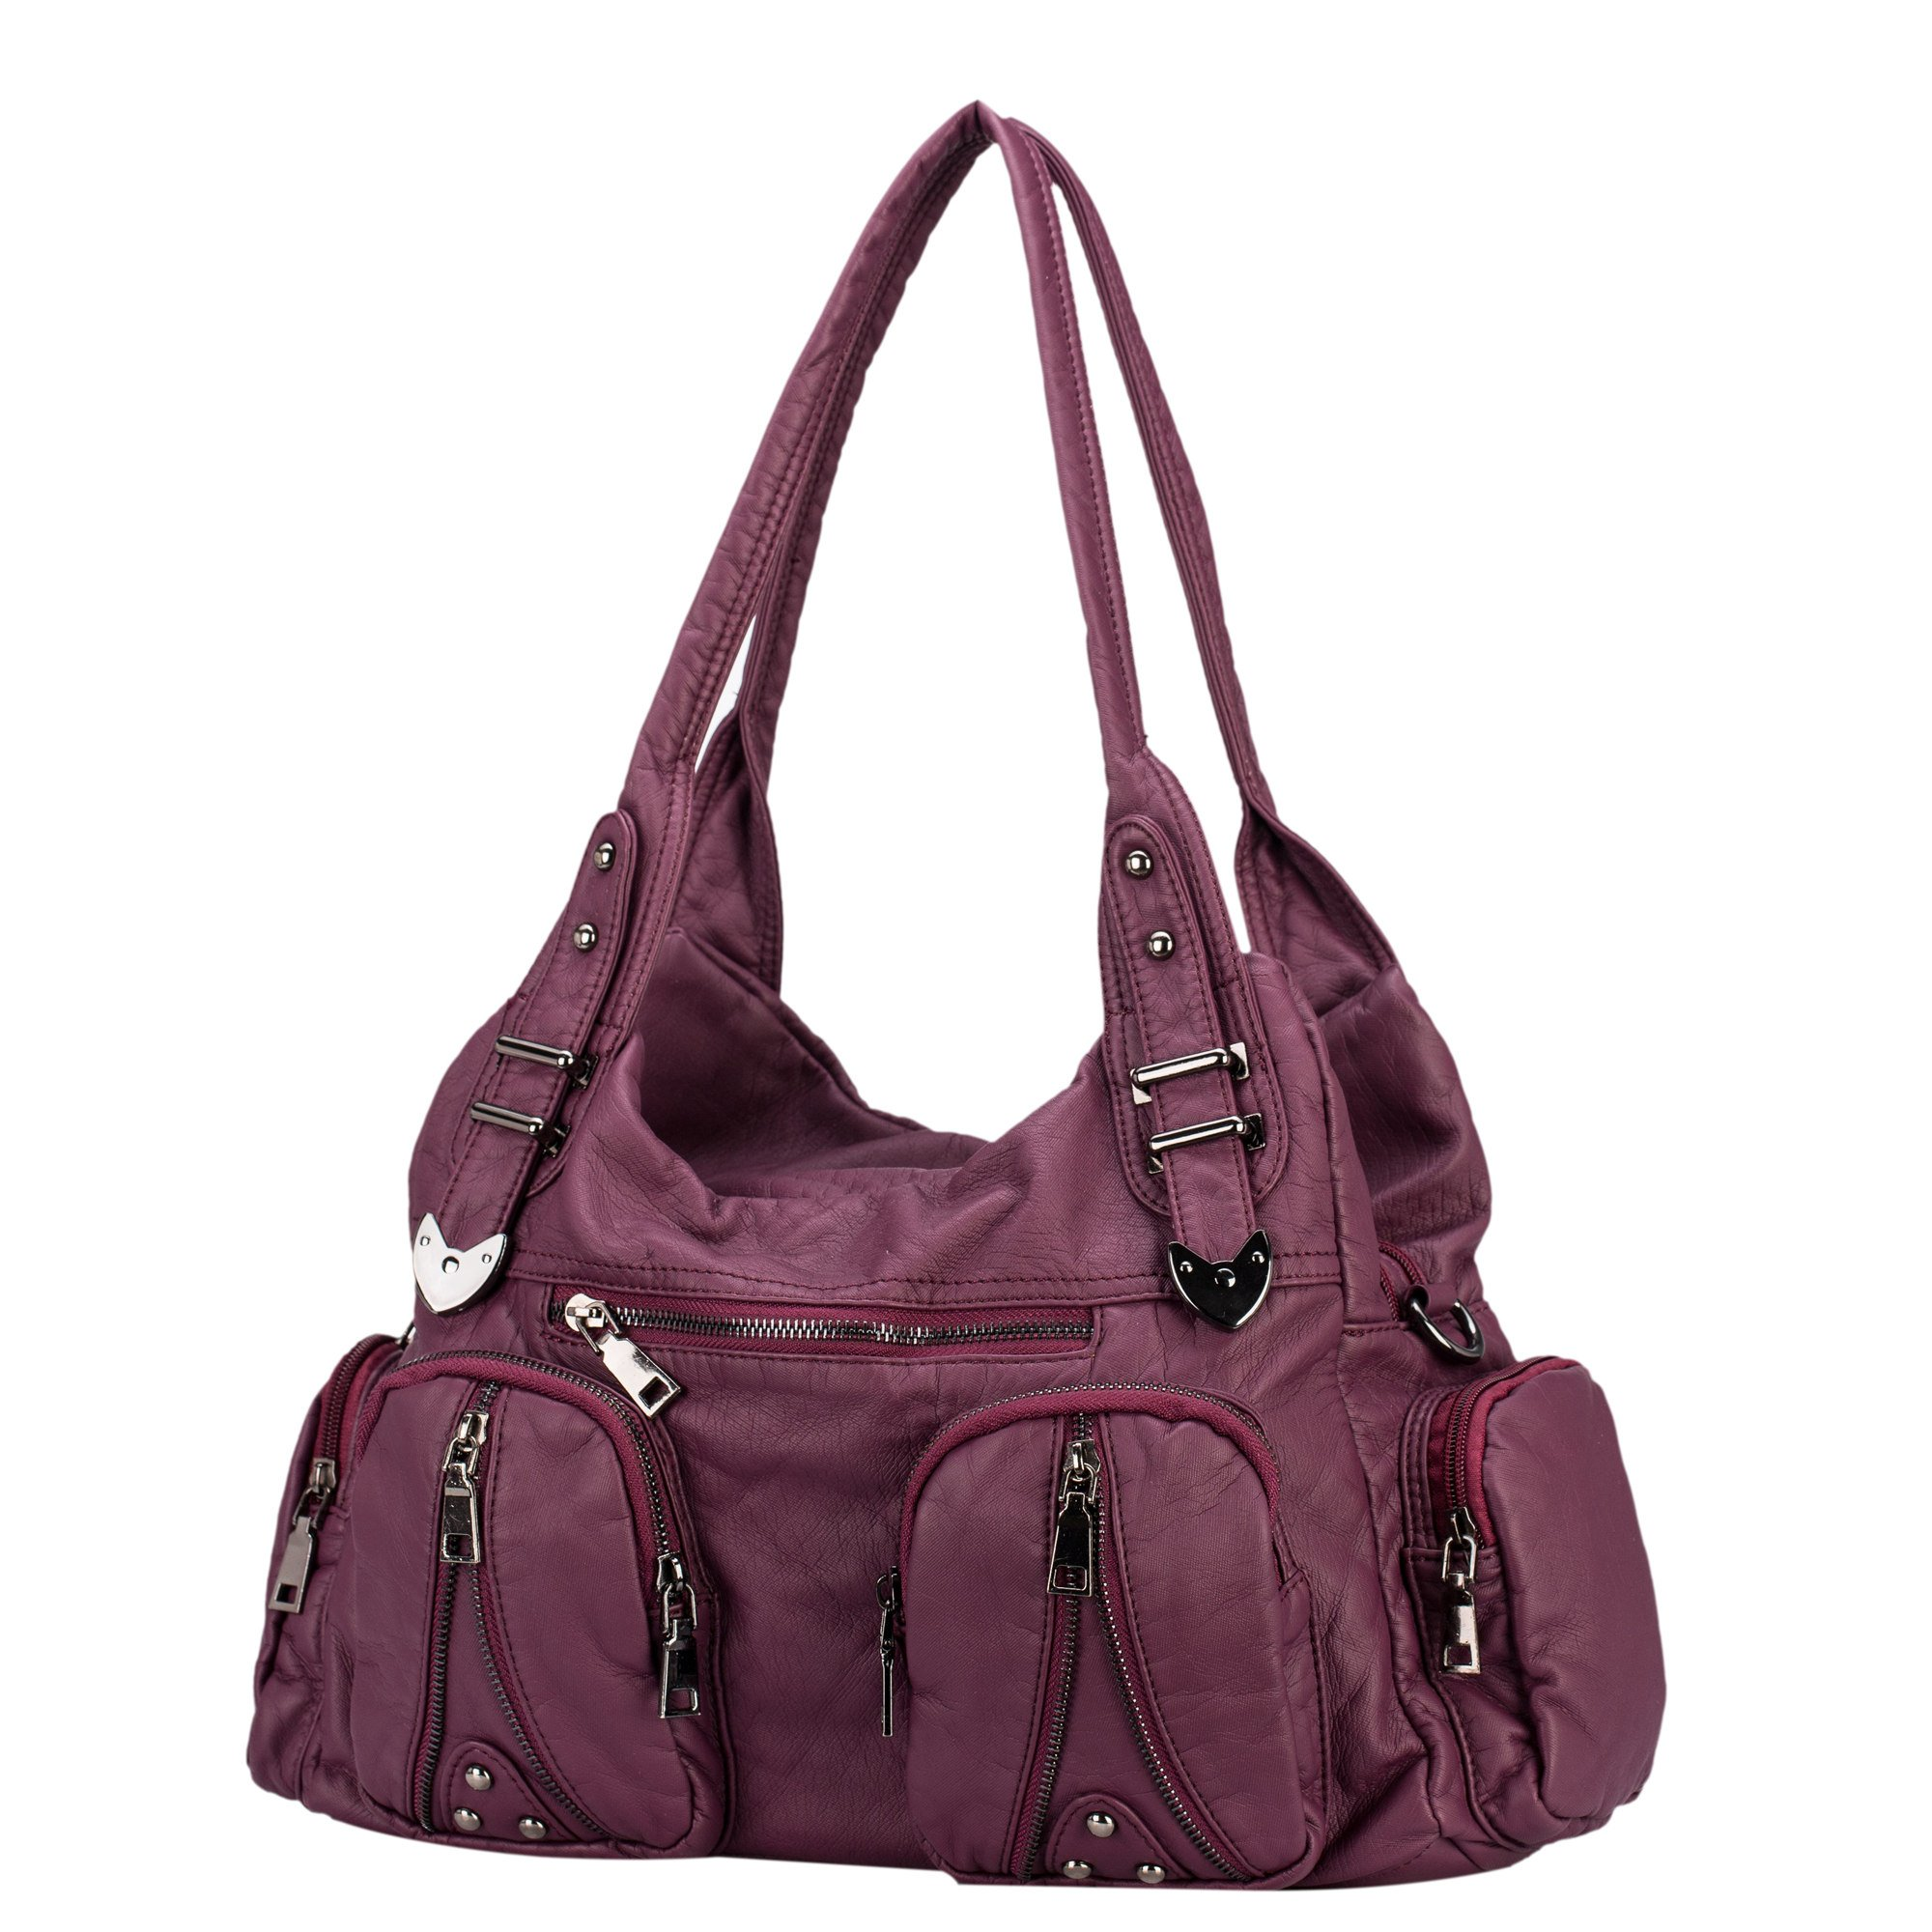 Classic Shoulder Bag Purse Soft Washed Leather Hobo Handbag Crossbody Bag for Women (purple)